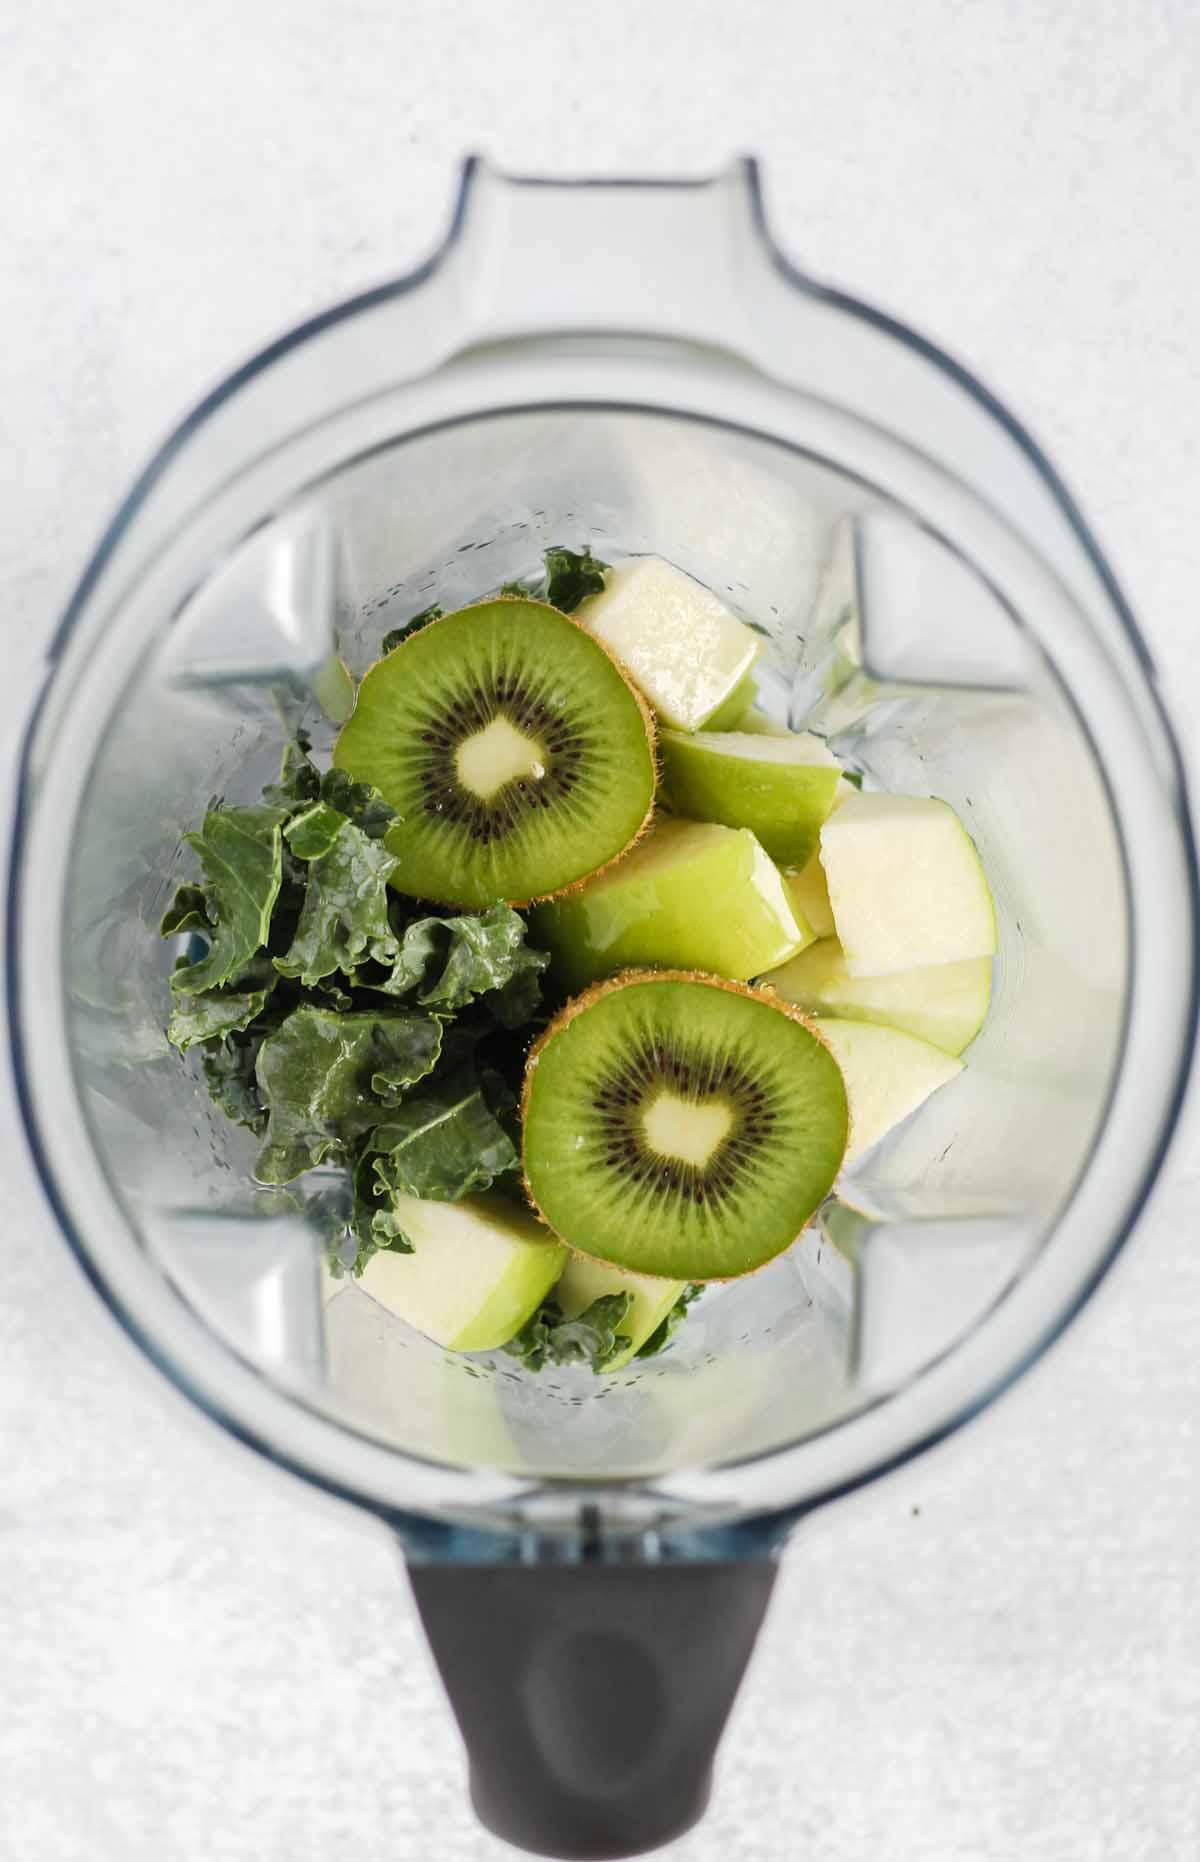 Ingredients for kale smoothie in a blender.